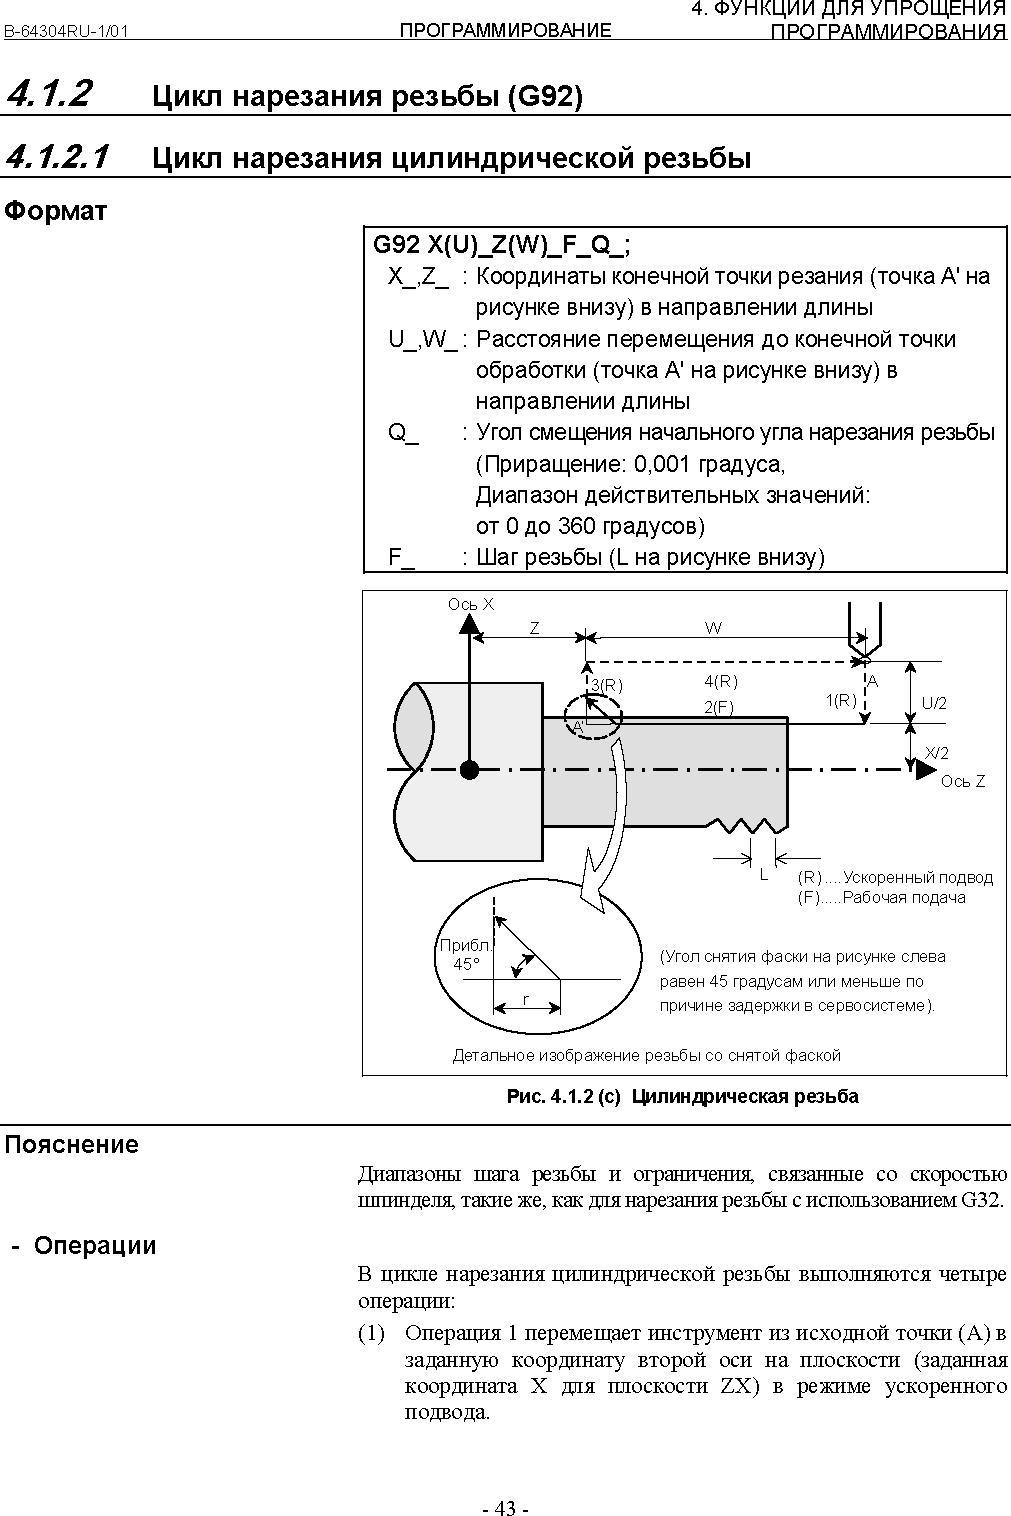 fanuc 0 j-td инструкция